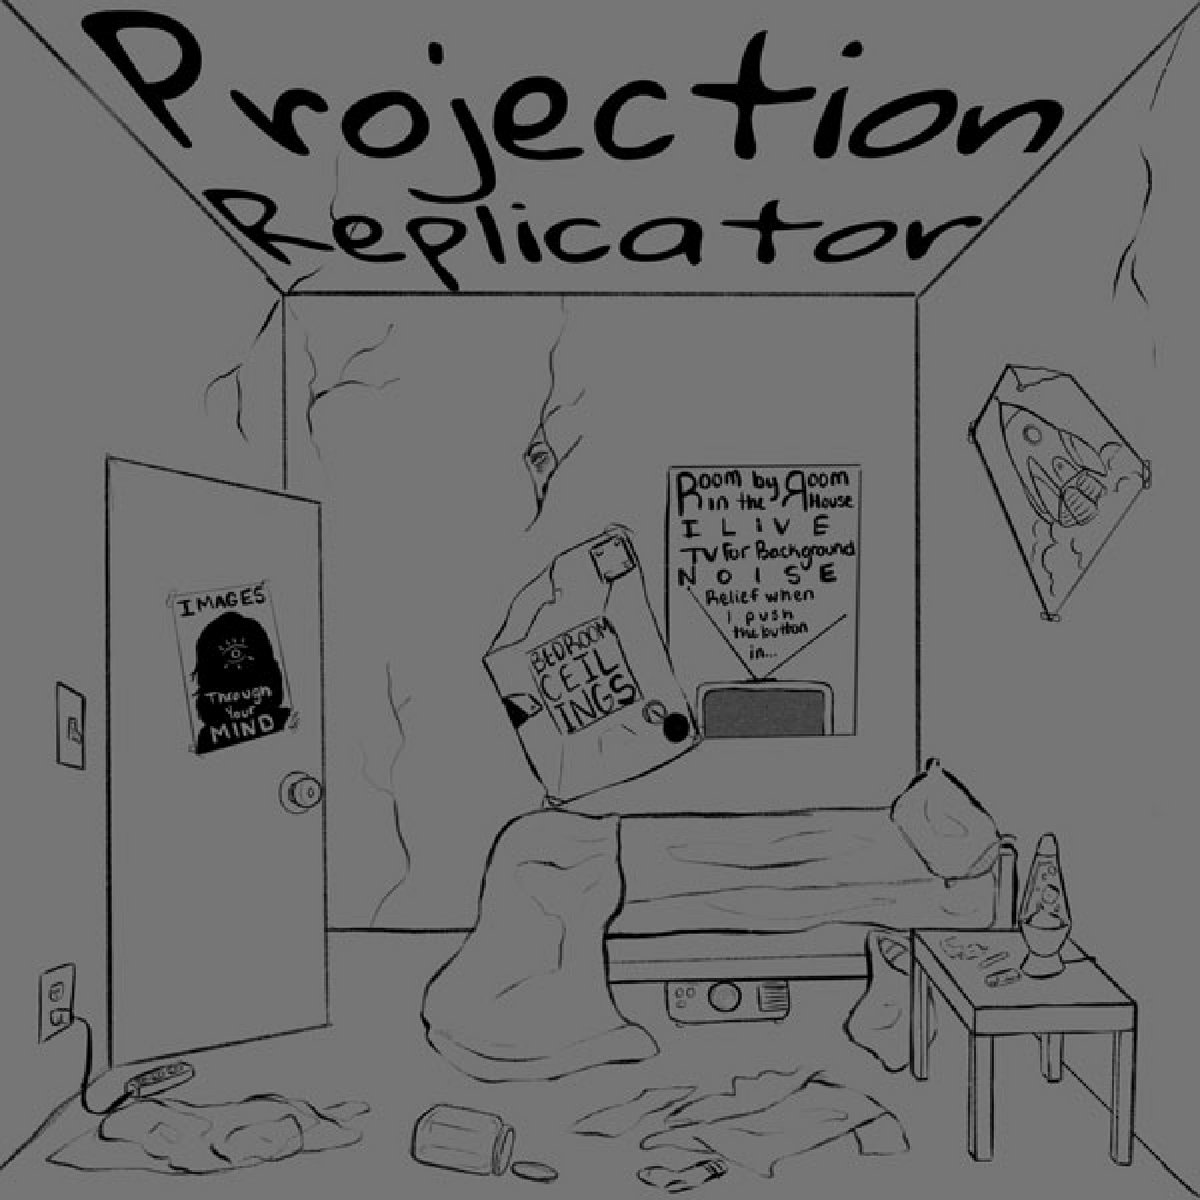 Projection Replicator Bedroom Ceilings